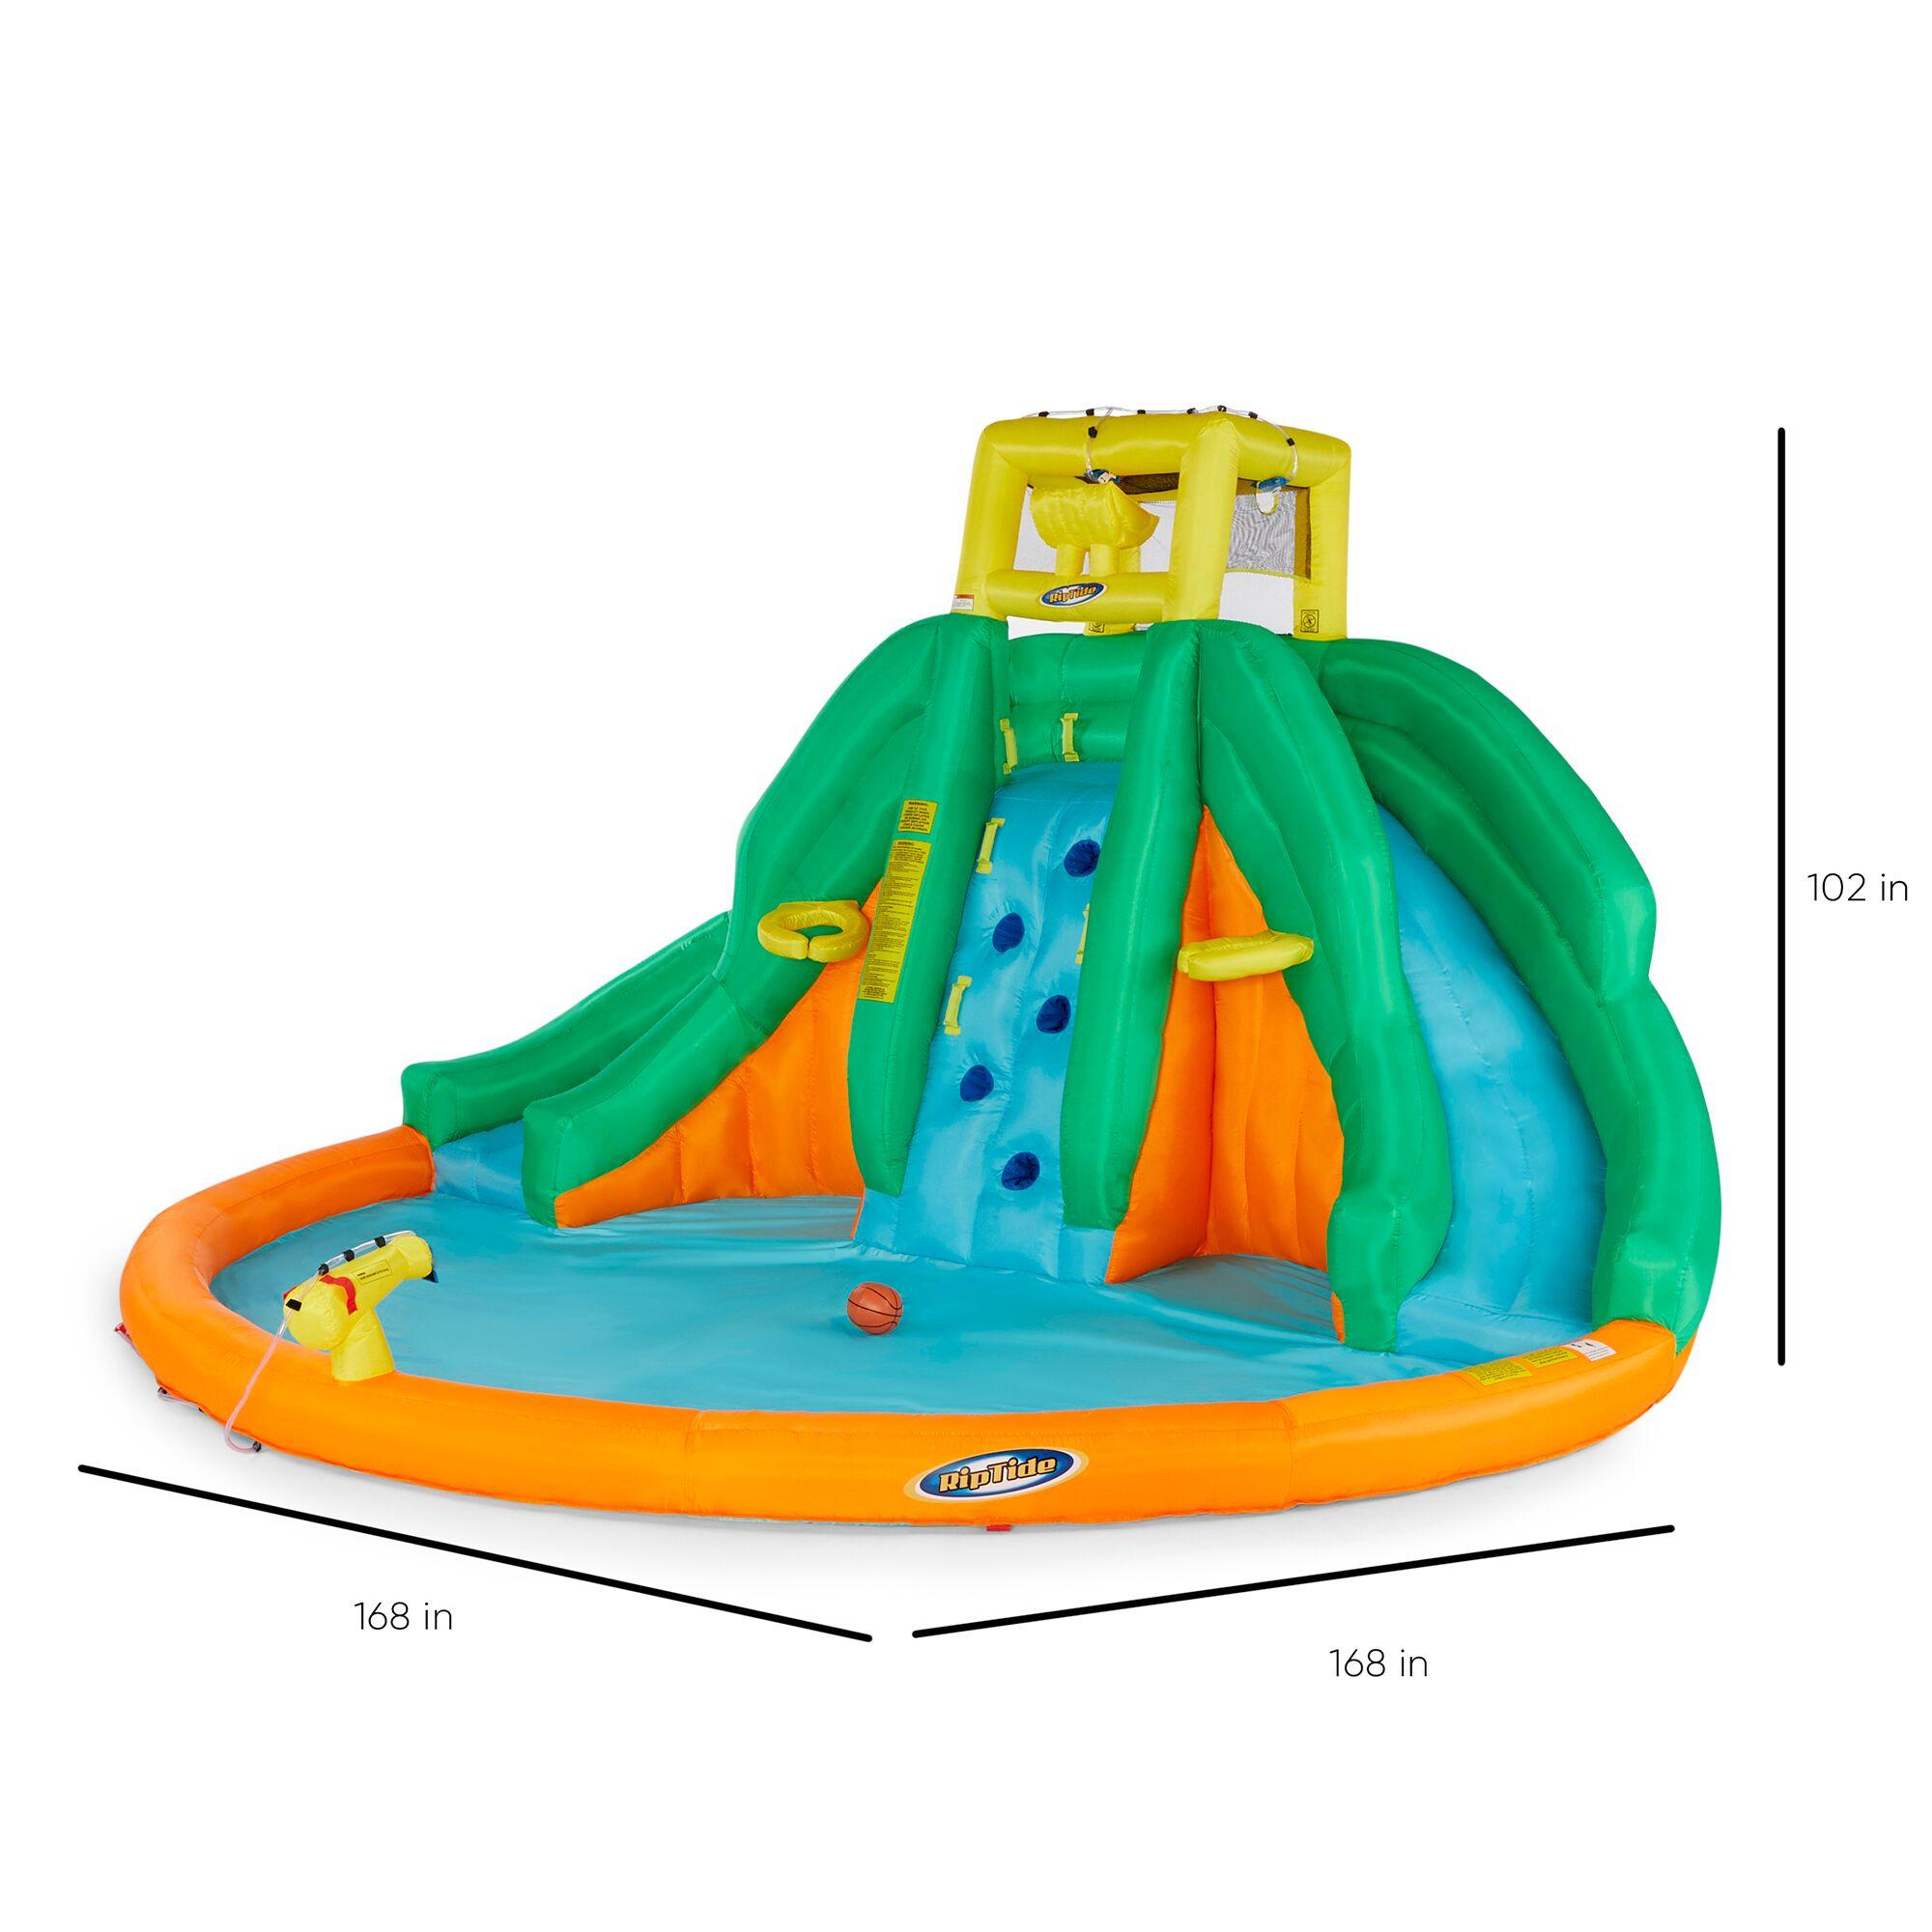 Kahuna Twin Peaks Kids Inflatable Pool Backyard Water ...